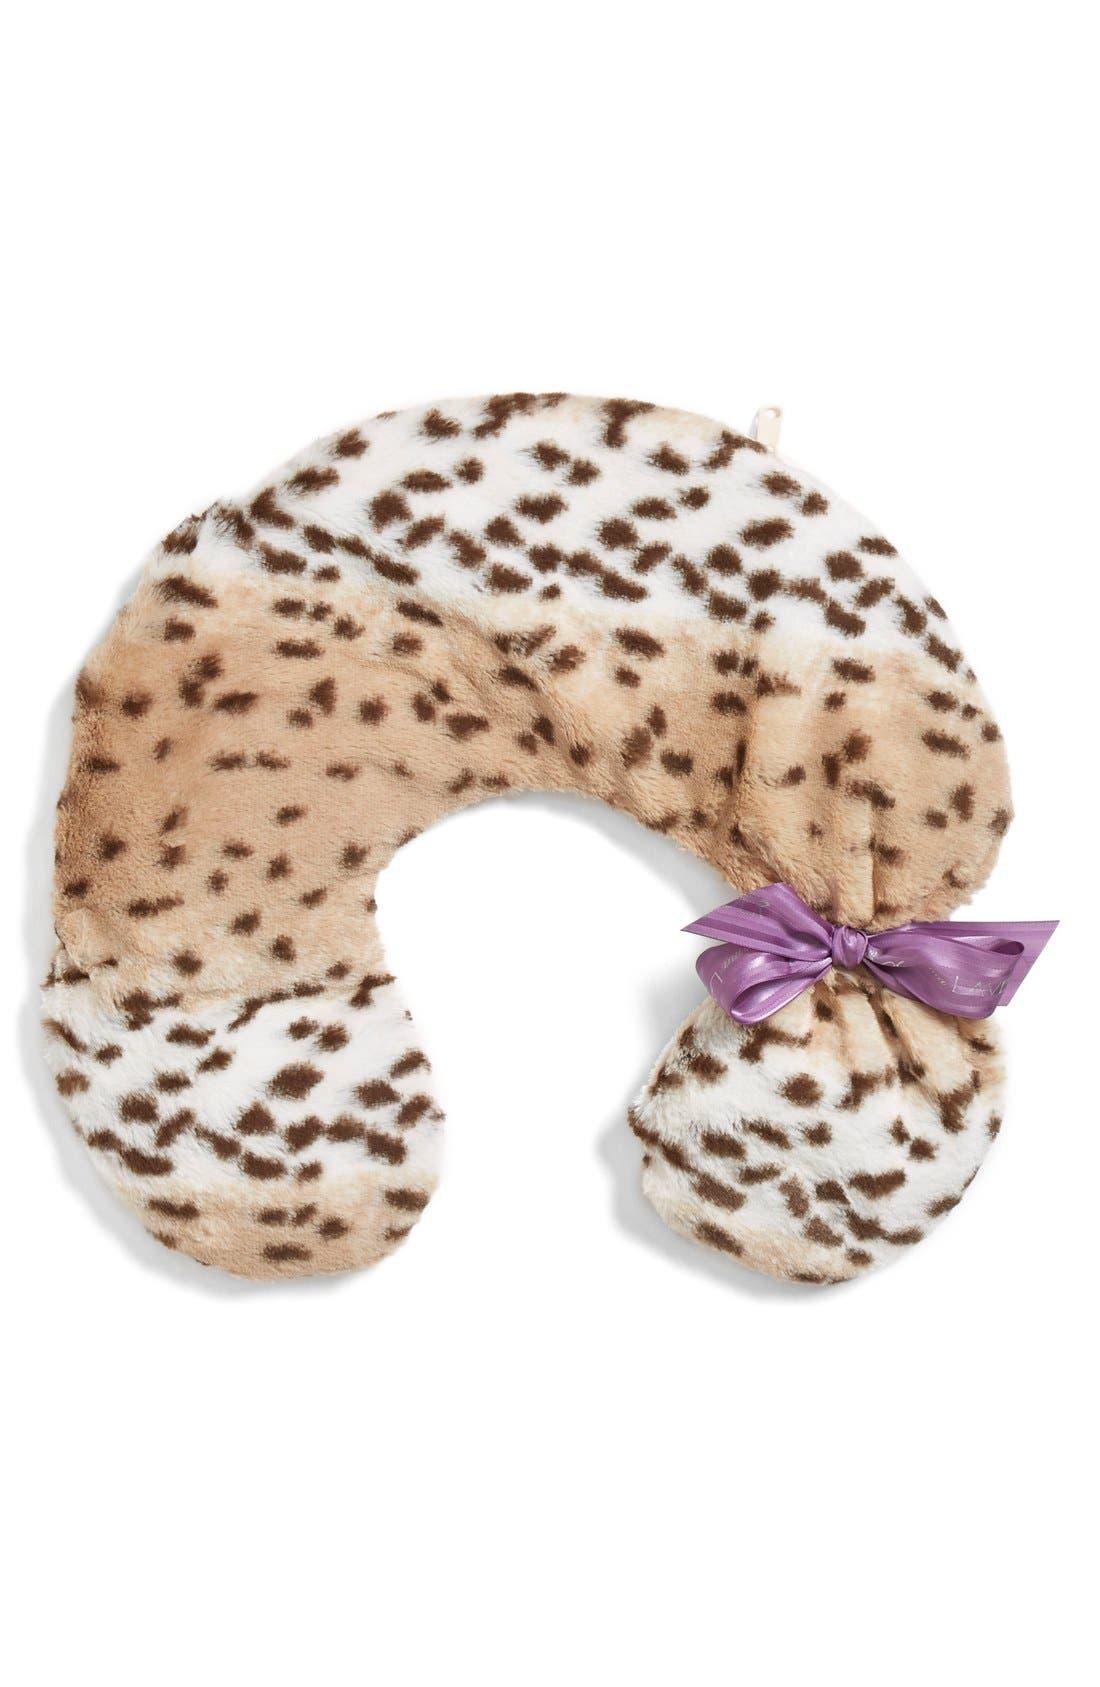 Sonoma Lavender Snow Leopard Neck Pillow Limited Edition